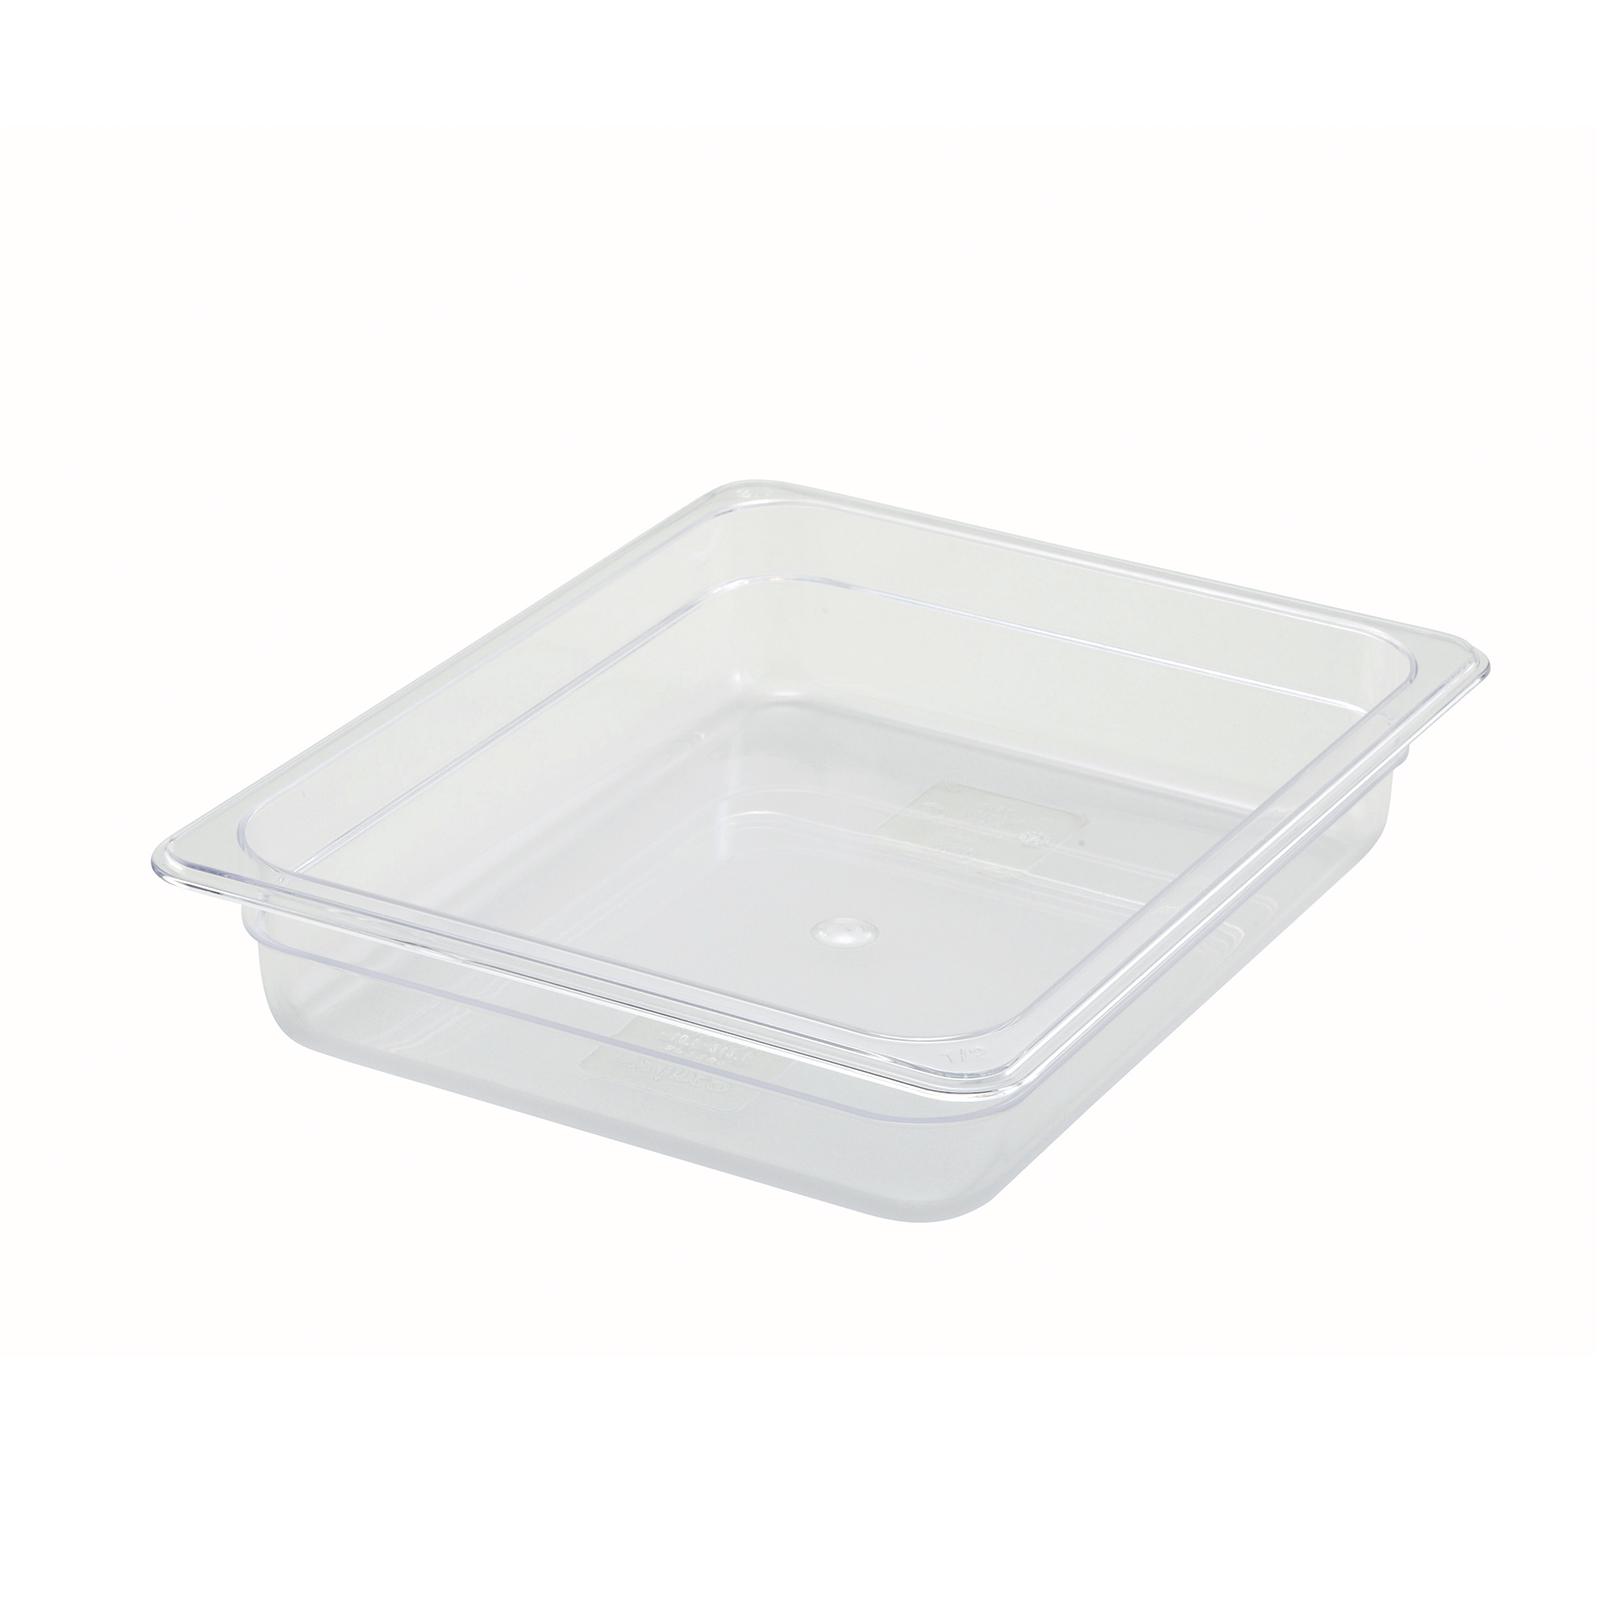 Winco SP7202 food pan, plastic